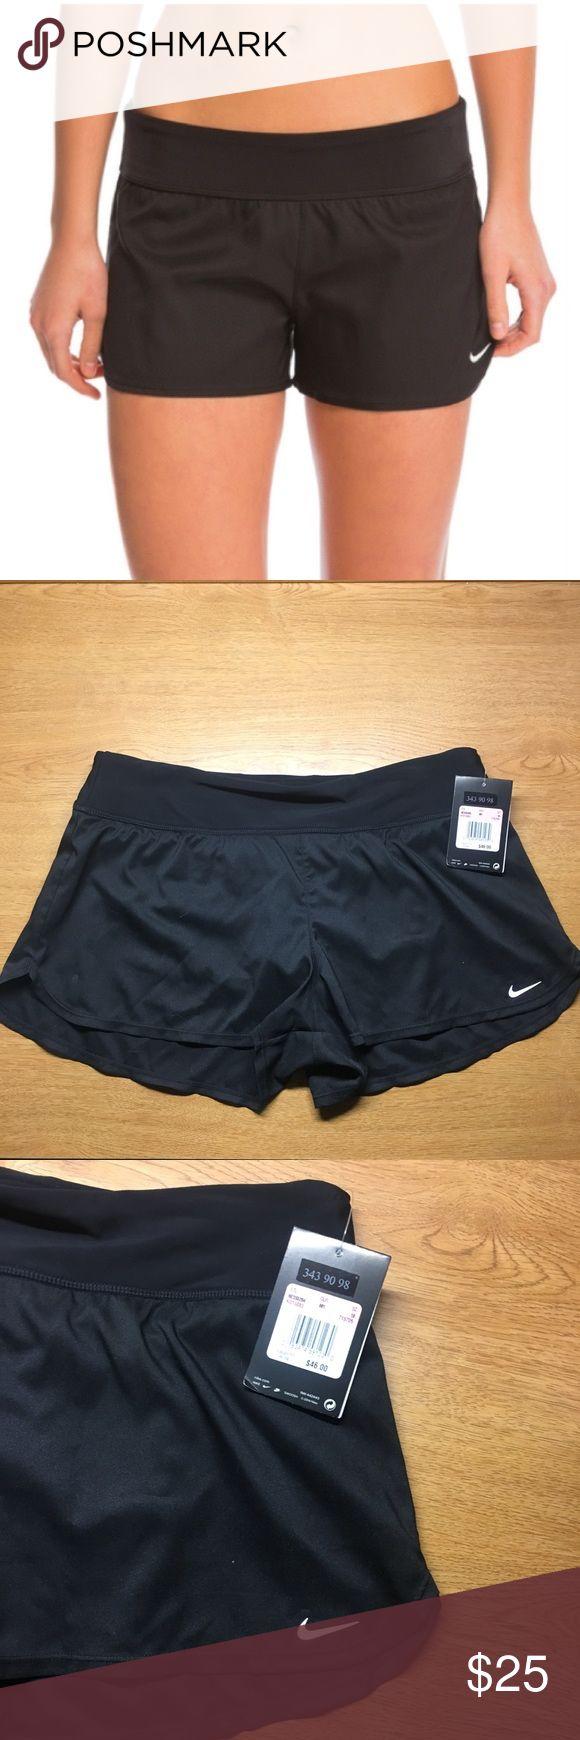 Nike she'd water swim shorts. Brand new!! Can be worn as regular shorts as well as swim shorts! Size 10. Nike Swim